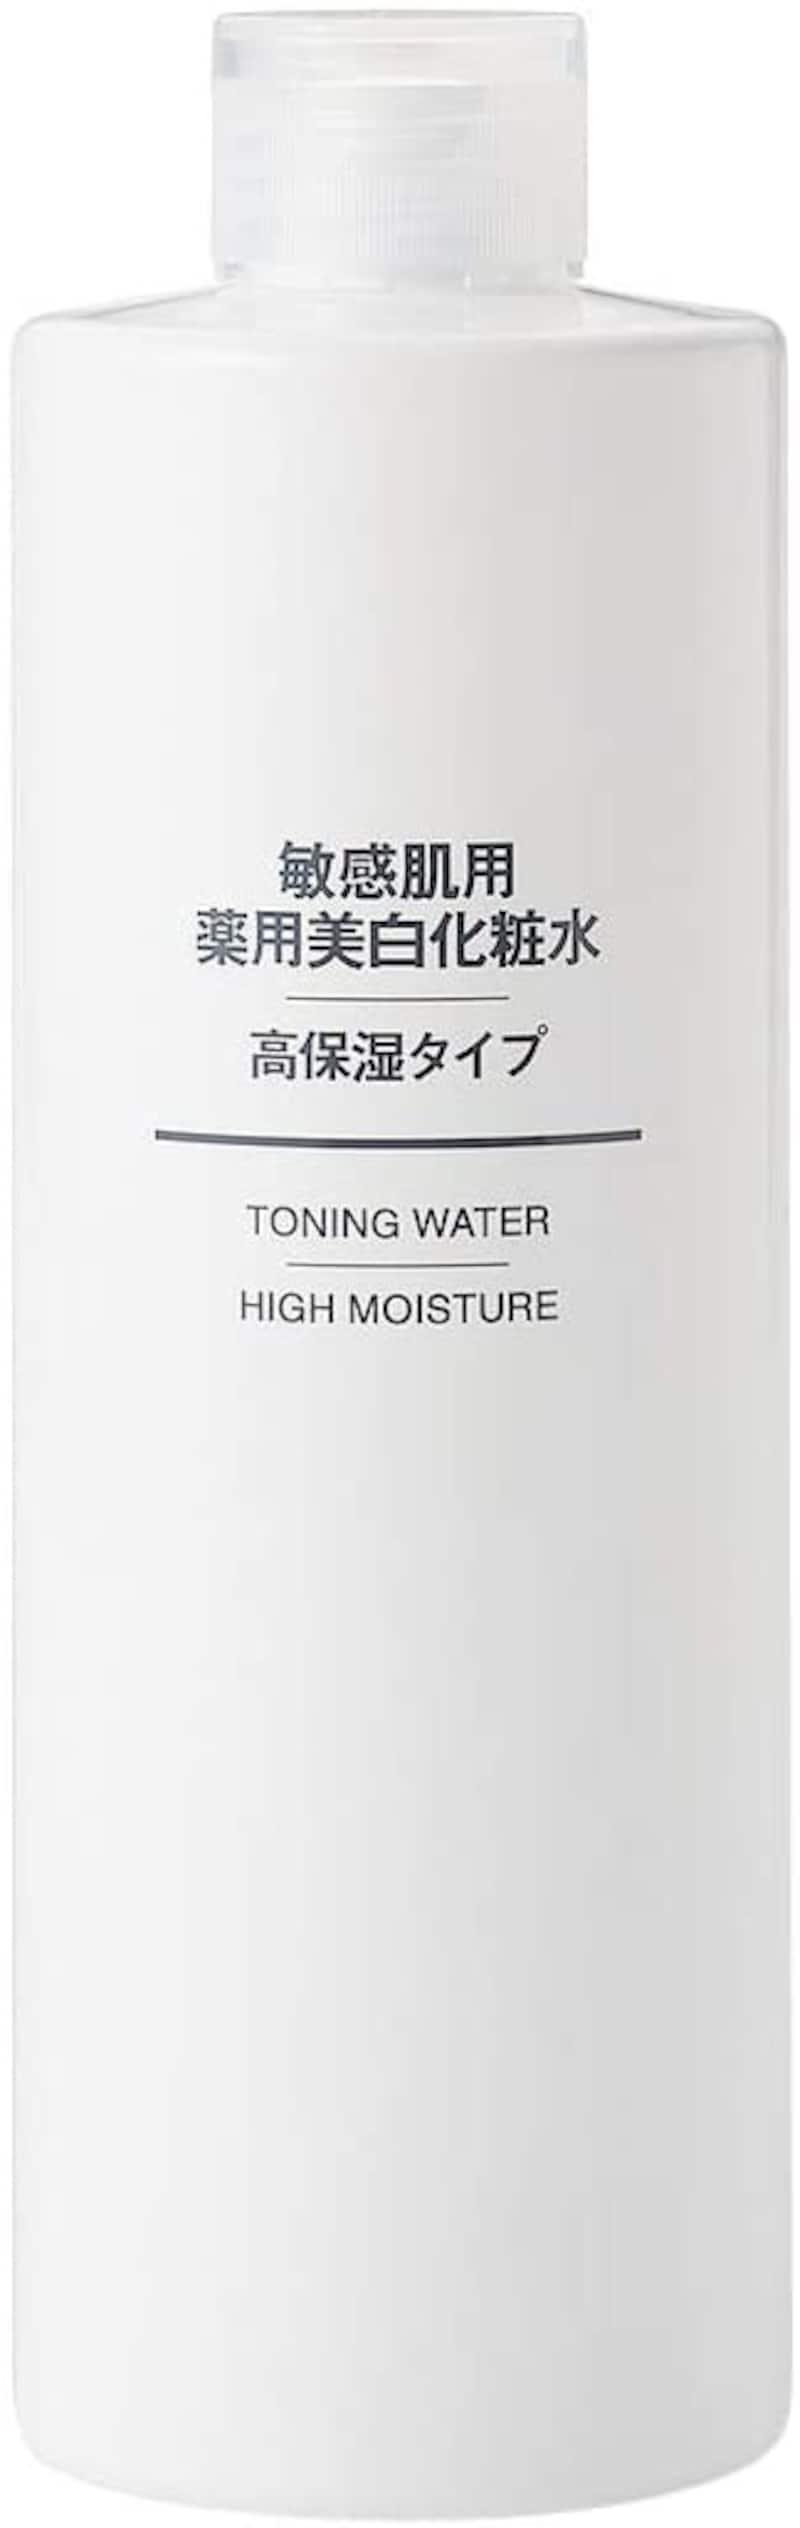 無印良品,敏感肌用 薬用美白化粧水 高保湿タイプ